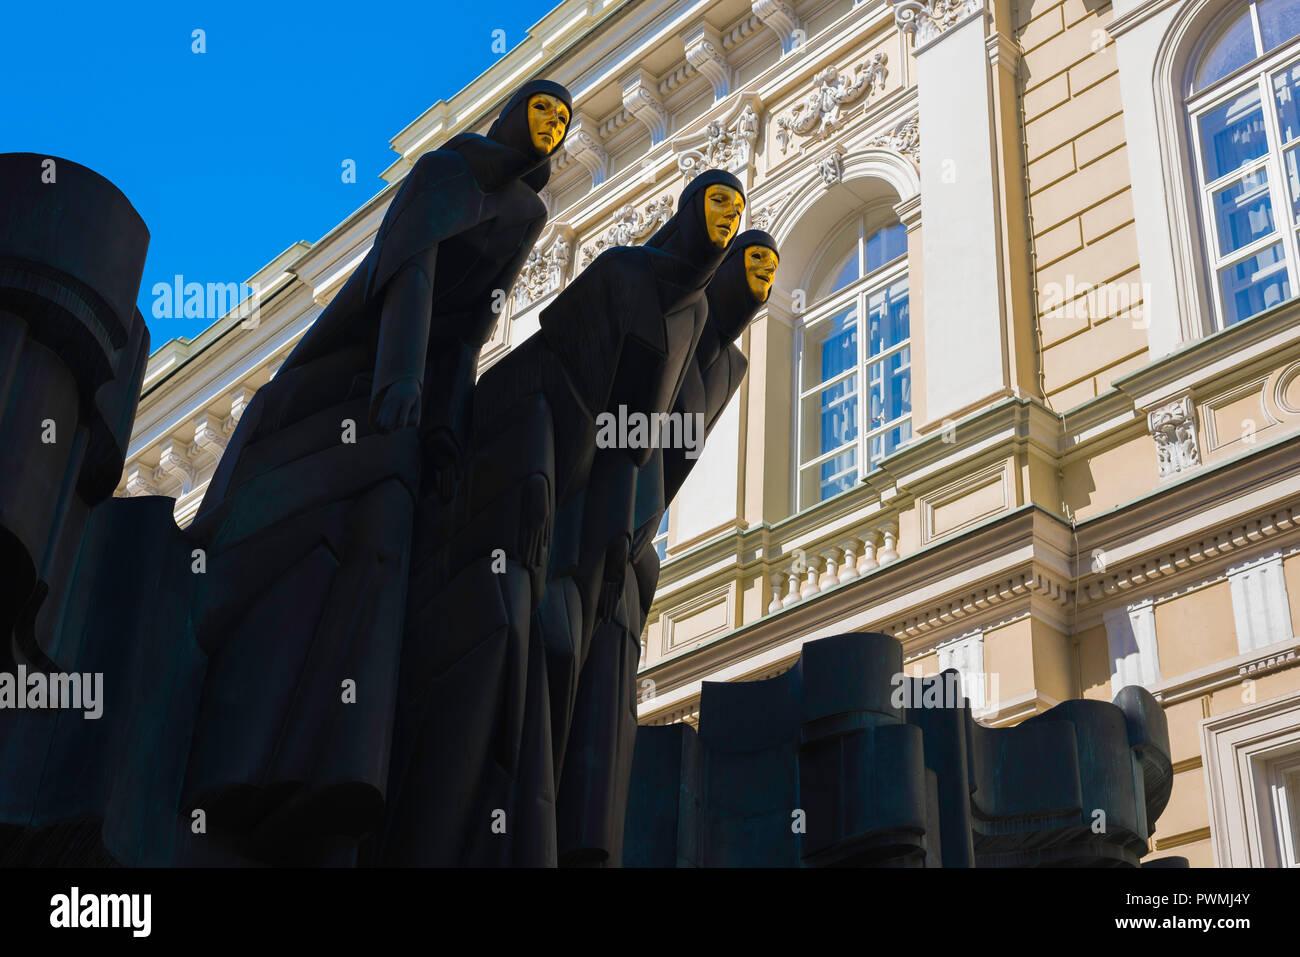 Vilnius tres Musas, vista de las tres Musas estatua situada encima de la entrada del Teatro Nacional de Lituania, Vilnius, Lituania. Foto de stock